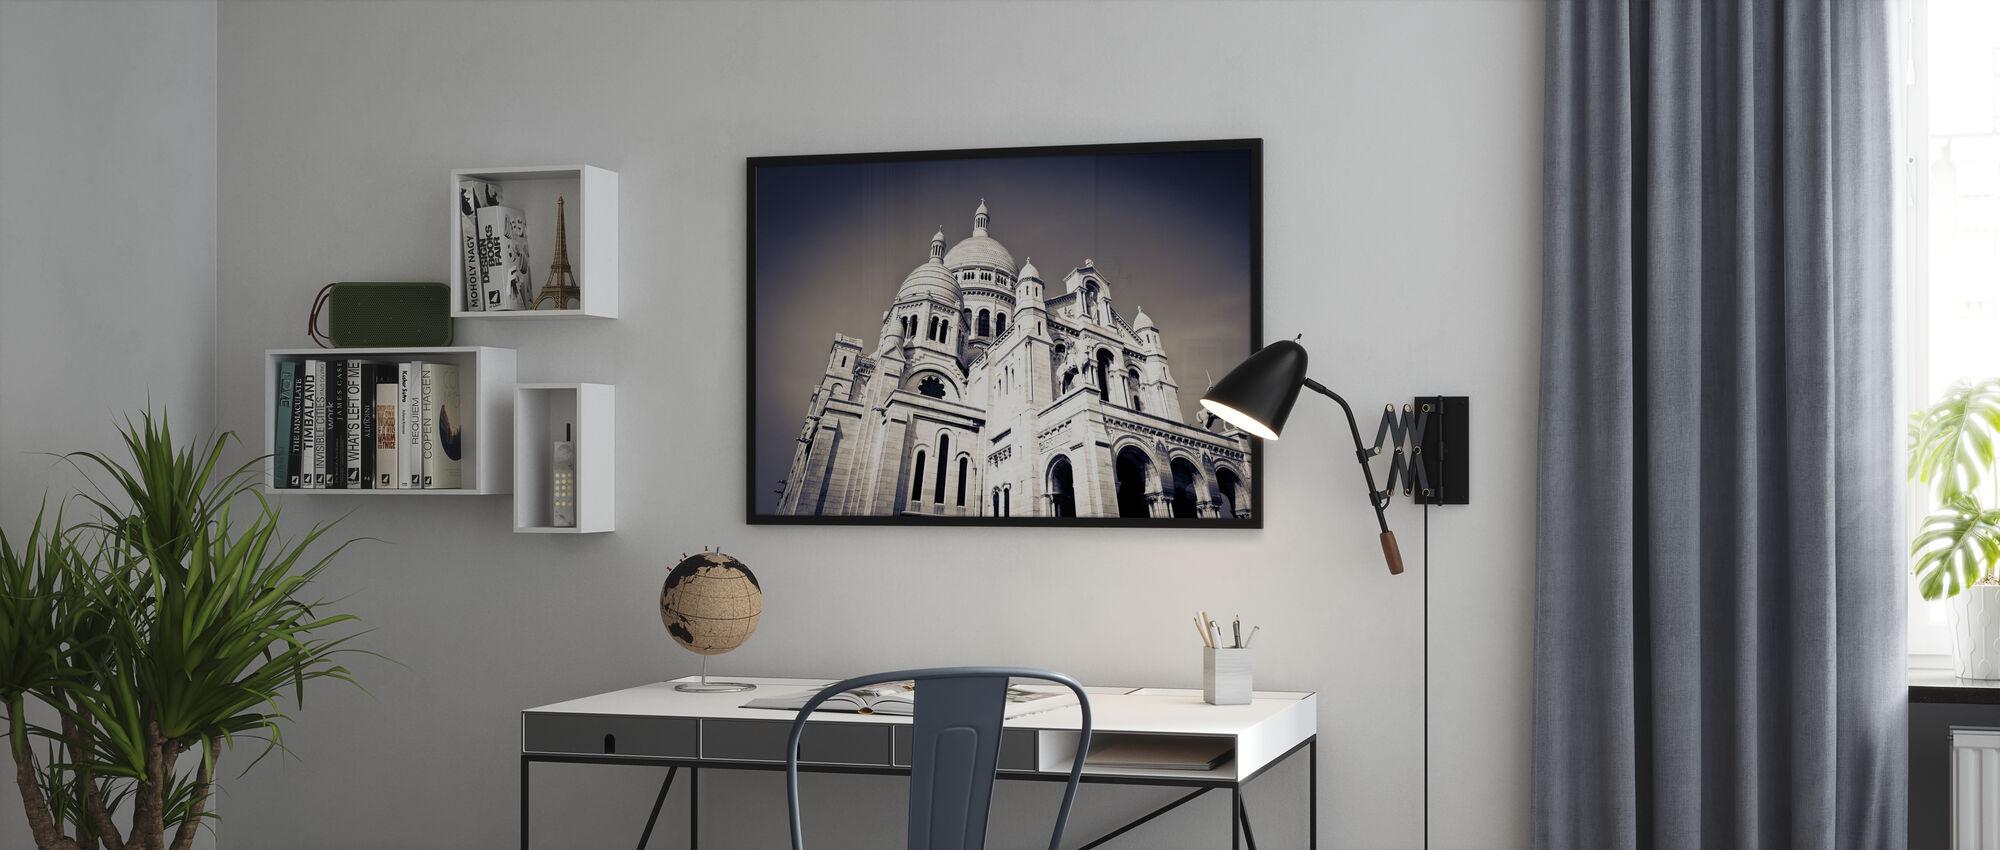 Sacre Coeur Basilica in Montmarte - Poster - Office